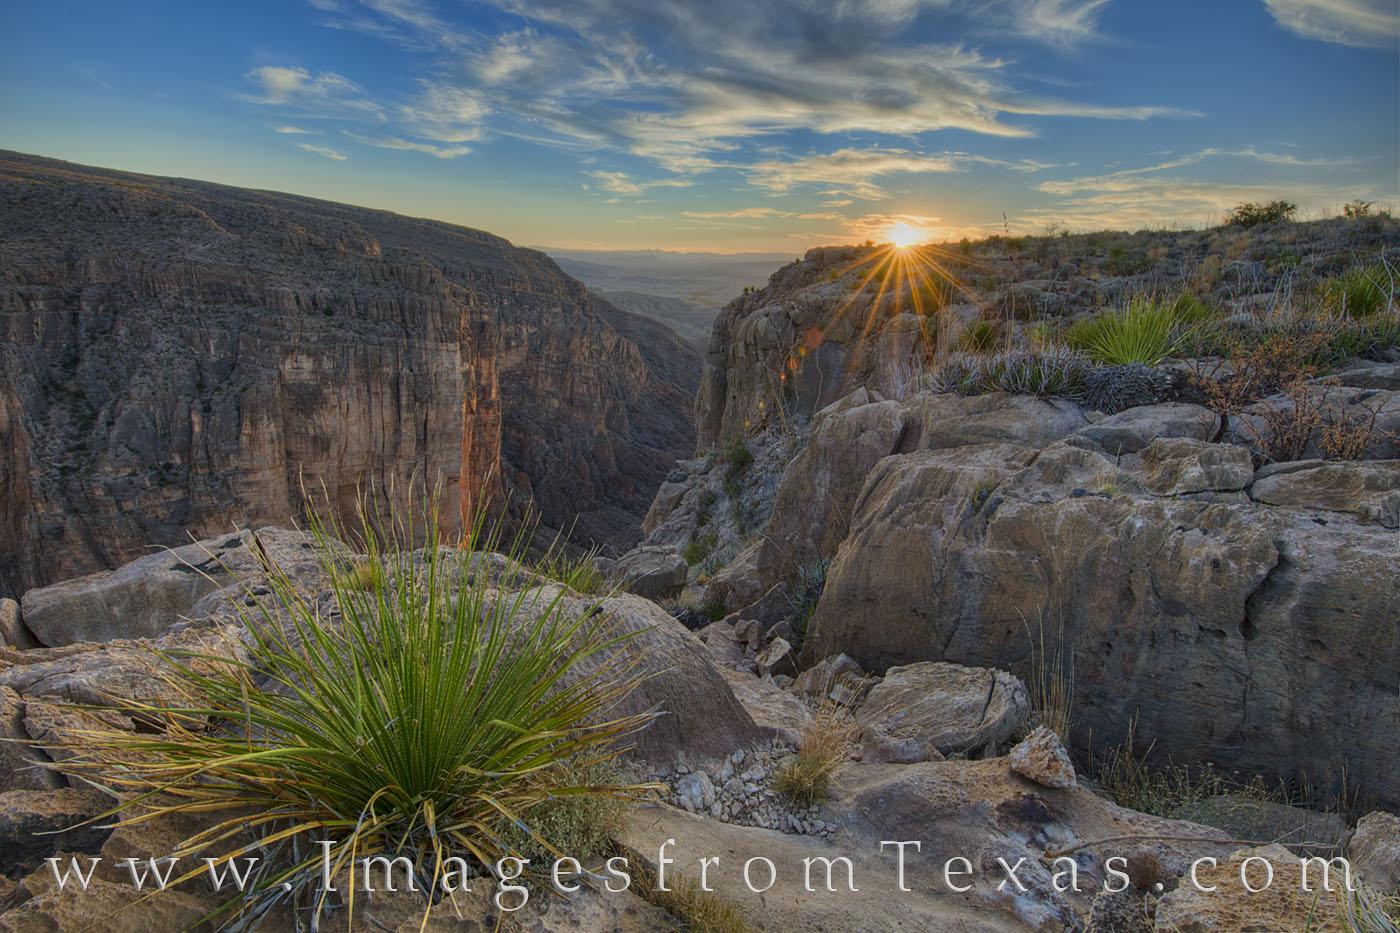 Mariscal canyon, sunset, big bend national park, big bend canyons, canyon, rio grande, hiking, texas hikes, big bend hikes, texas adventures, texas landscape, texas canyons, Mariscal canyon images, photo